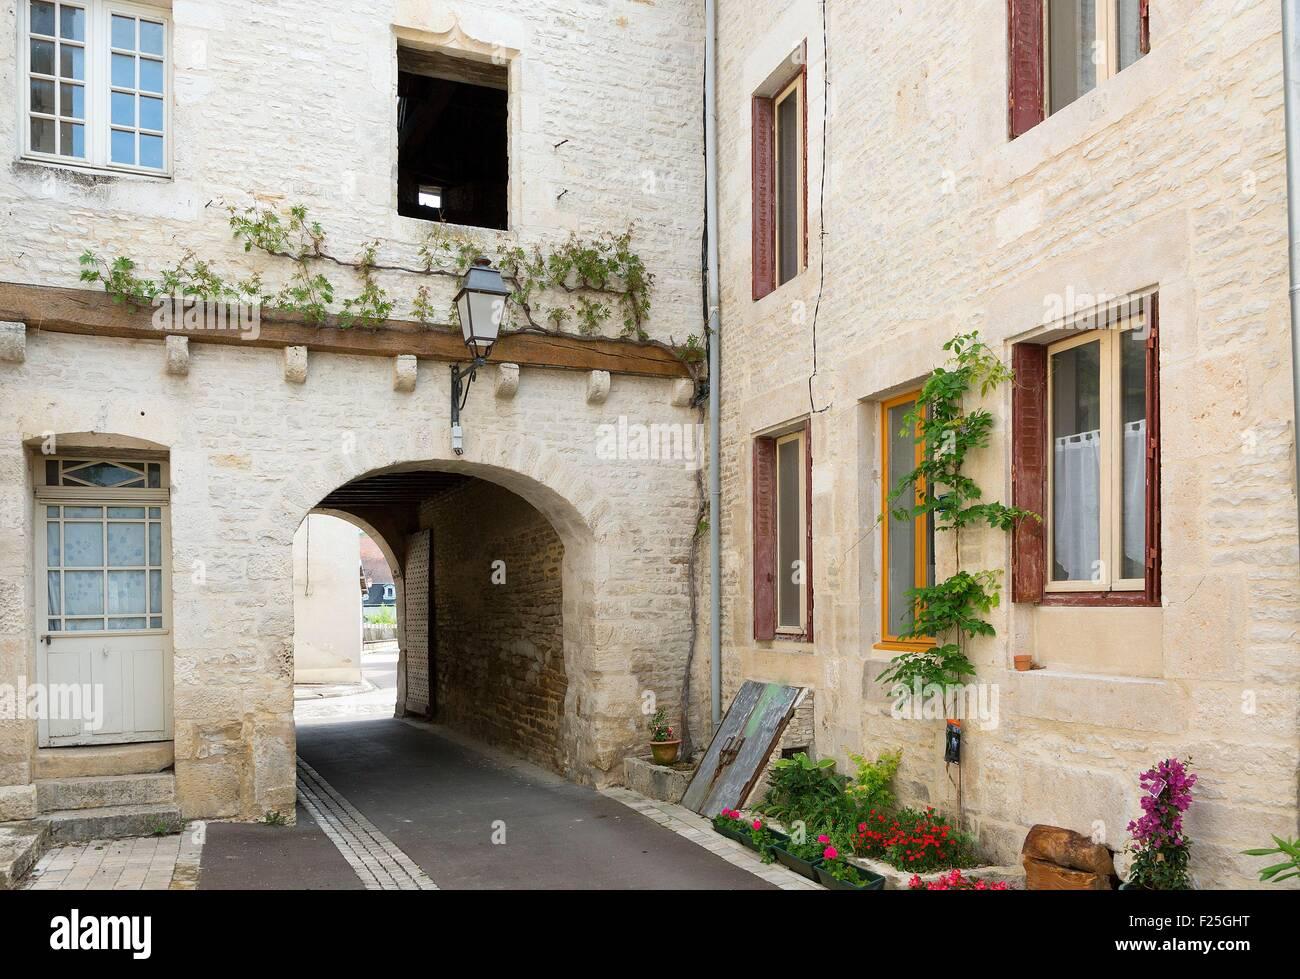 France, Aube (10), Mussy sur seine, the salt attic - Stock Image